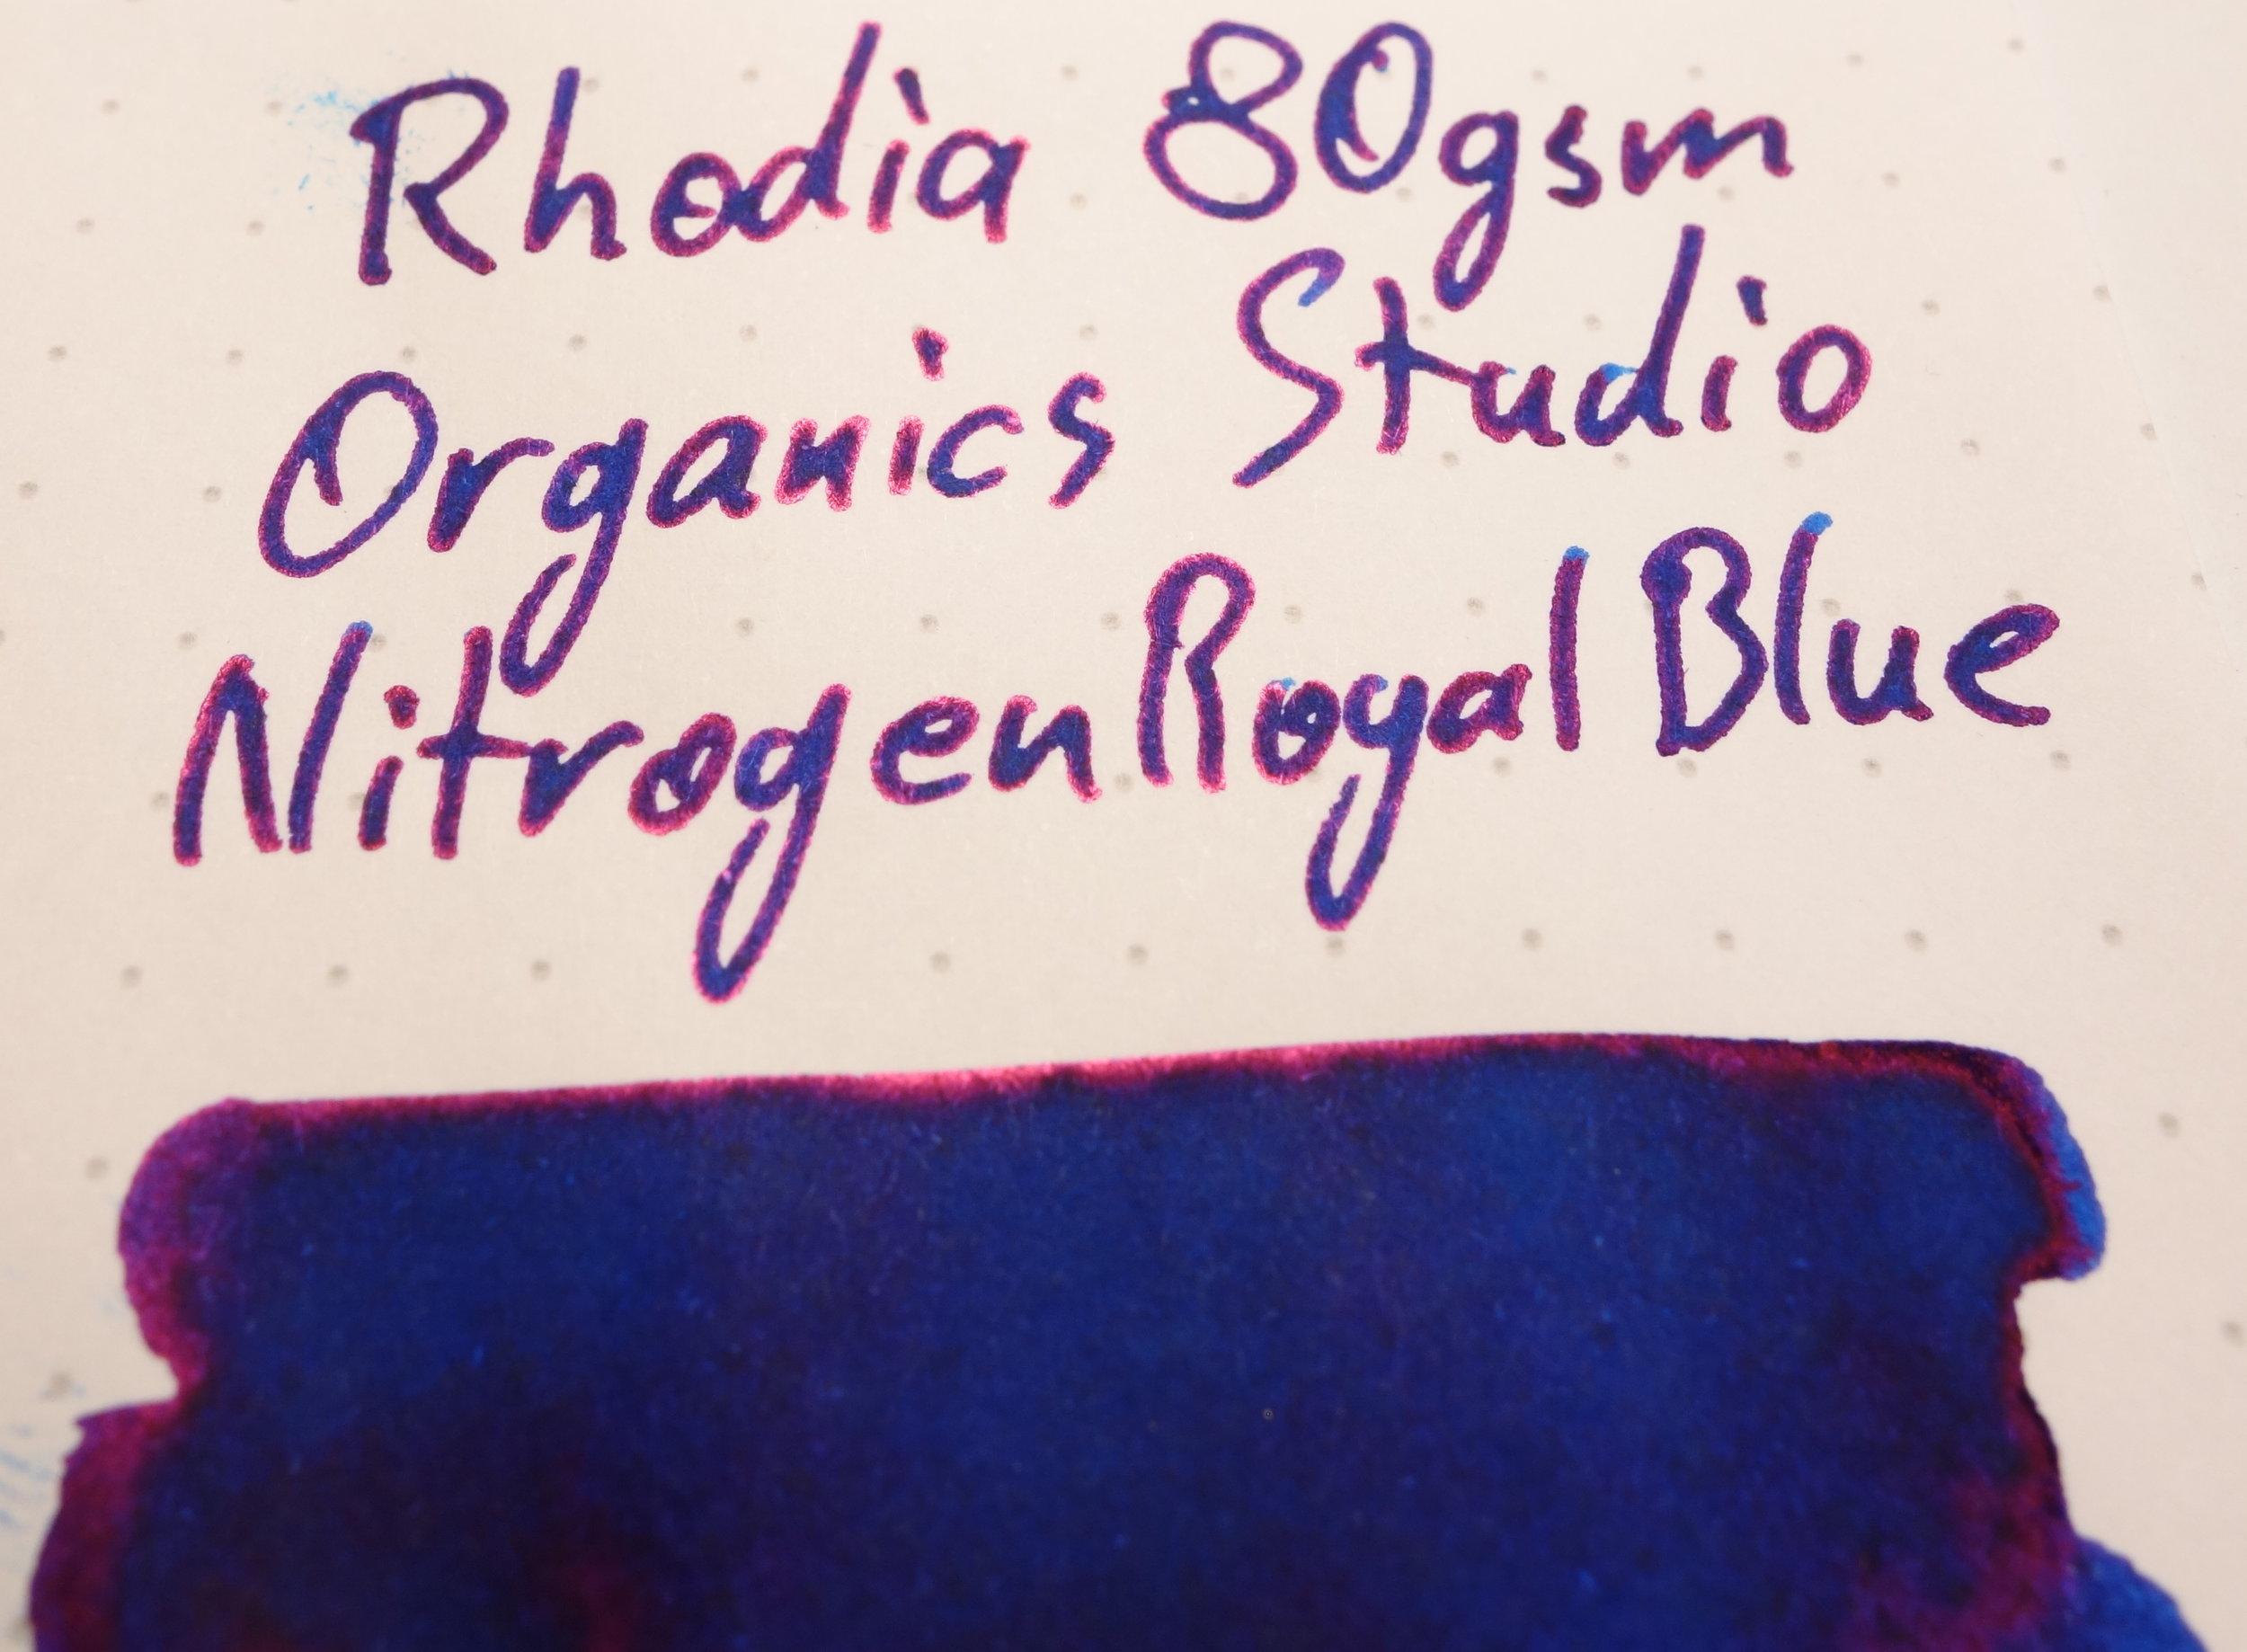 Organics Studio Nitrogen Royal Blue Sheen Rhodia.JPG